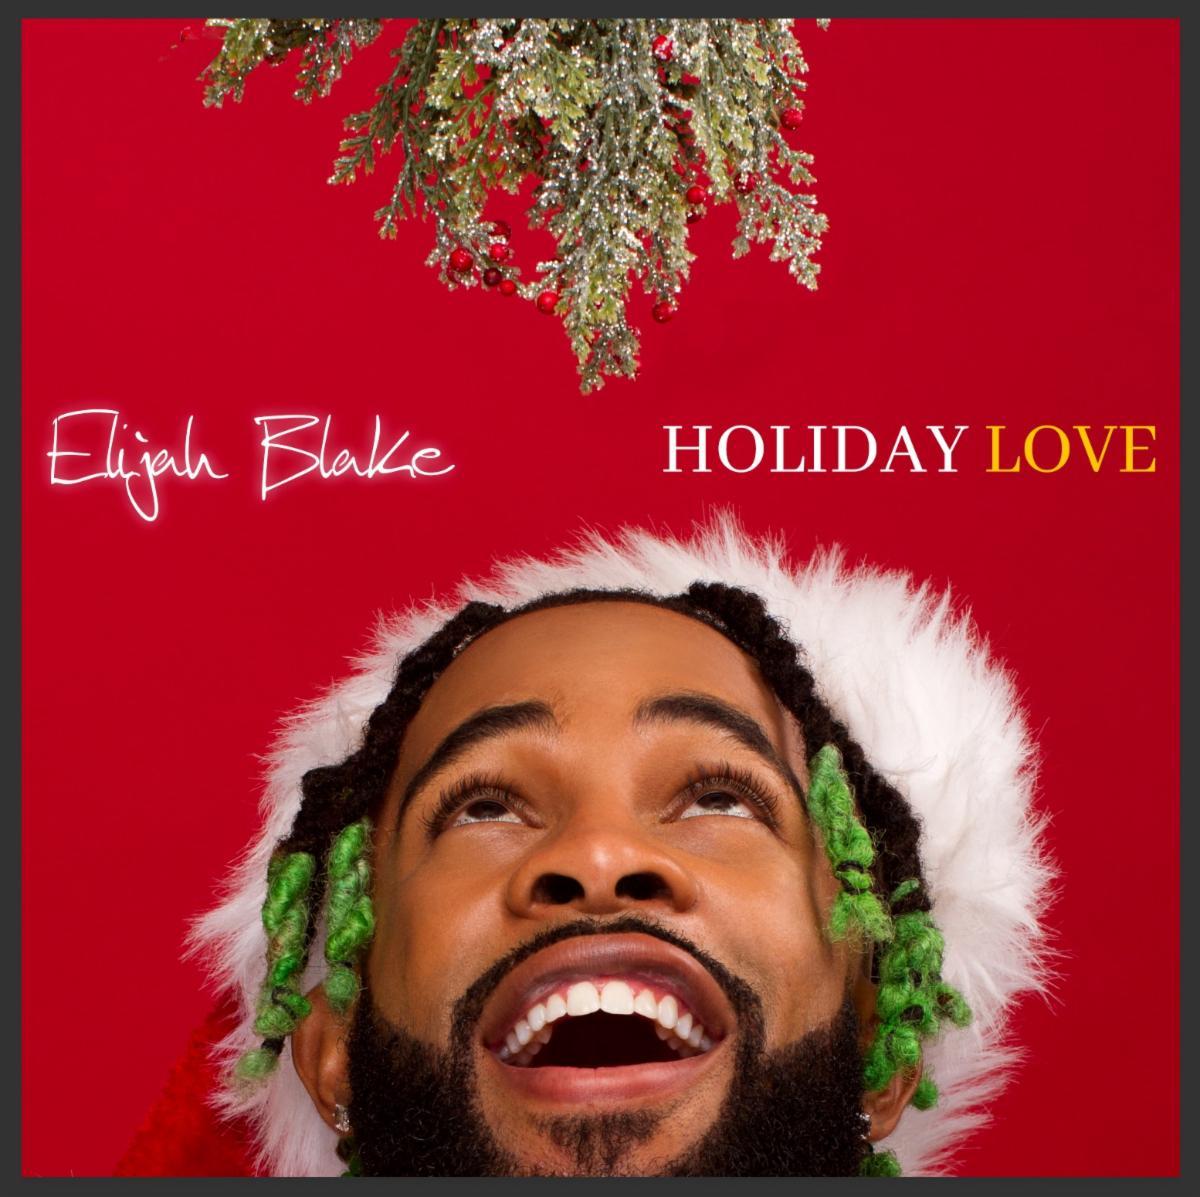 Elijah Blake Holiday Love EP Cover